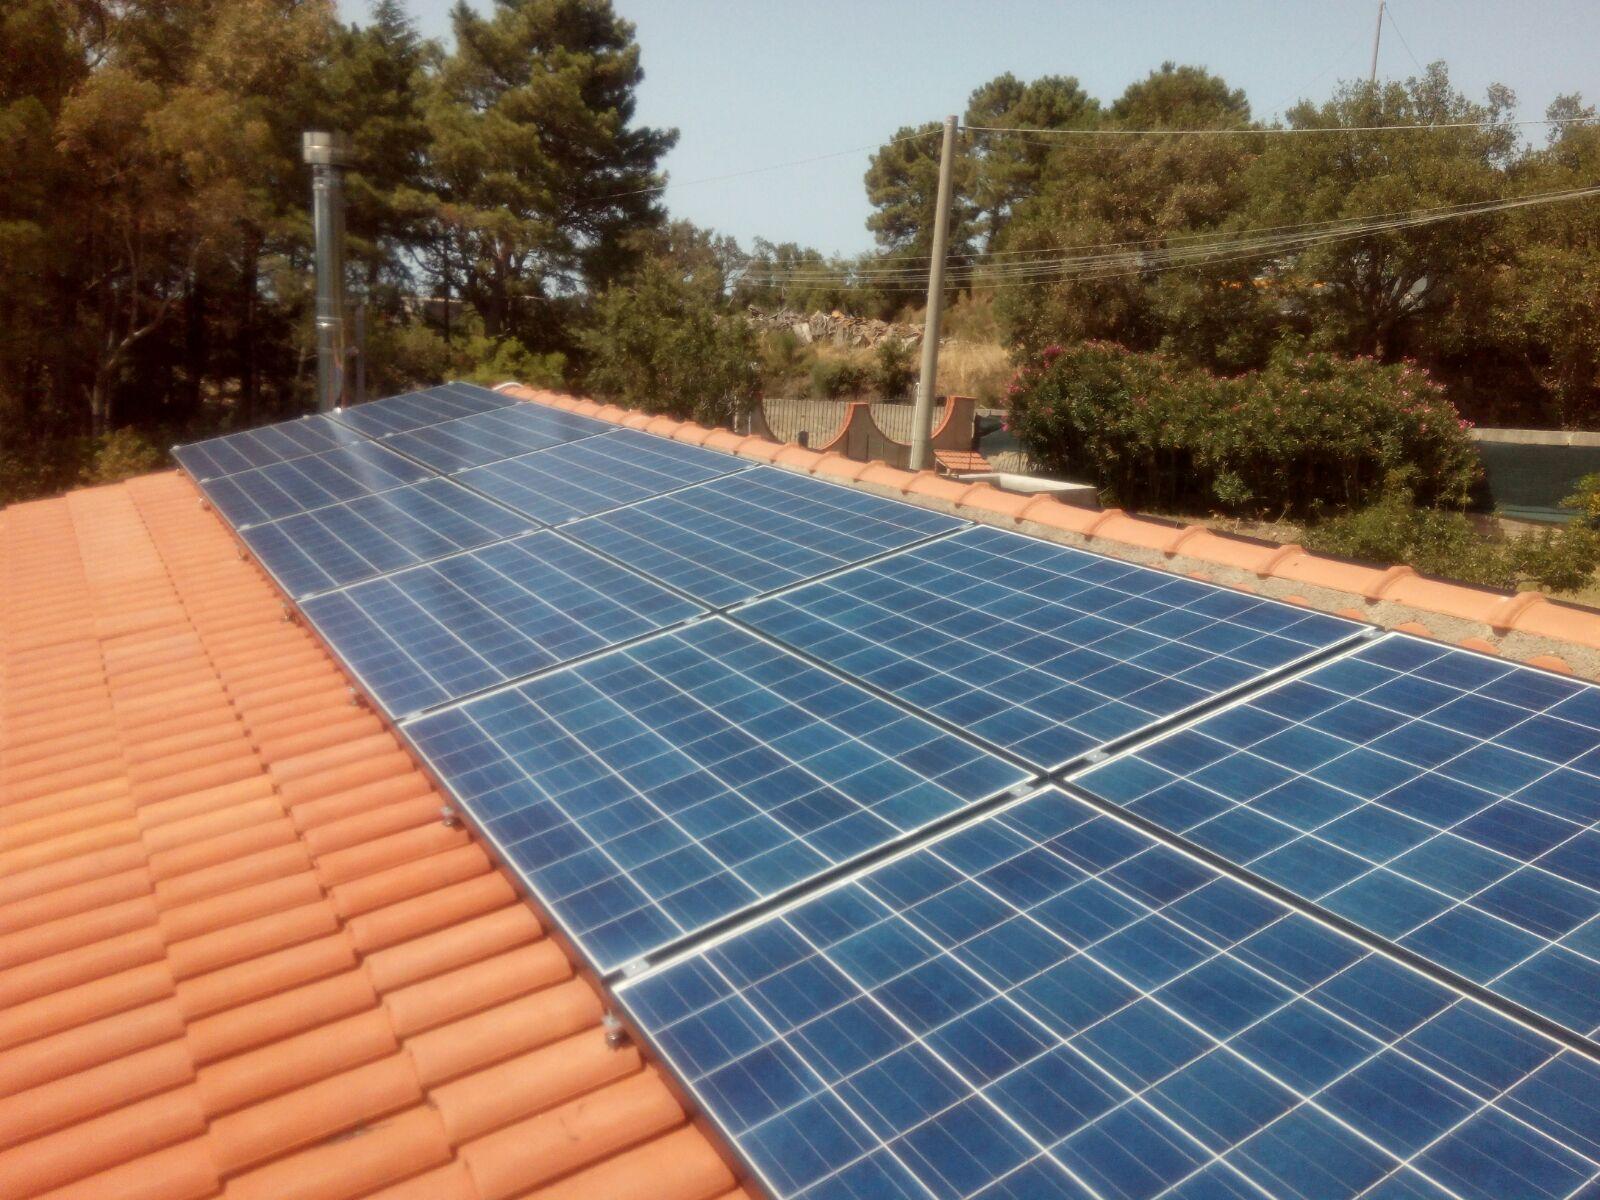 Impianti Fotovoltaici Per Risparmiare : Impianto fotovoltaico green power energia